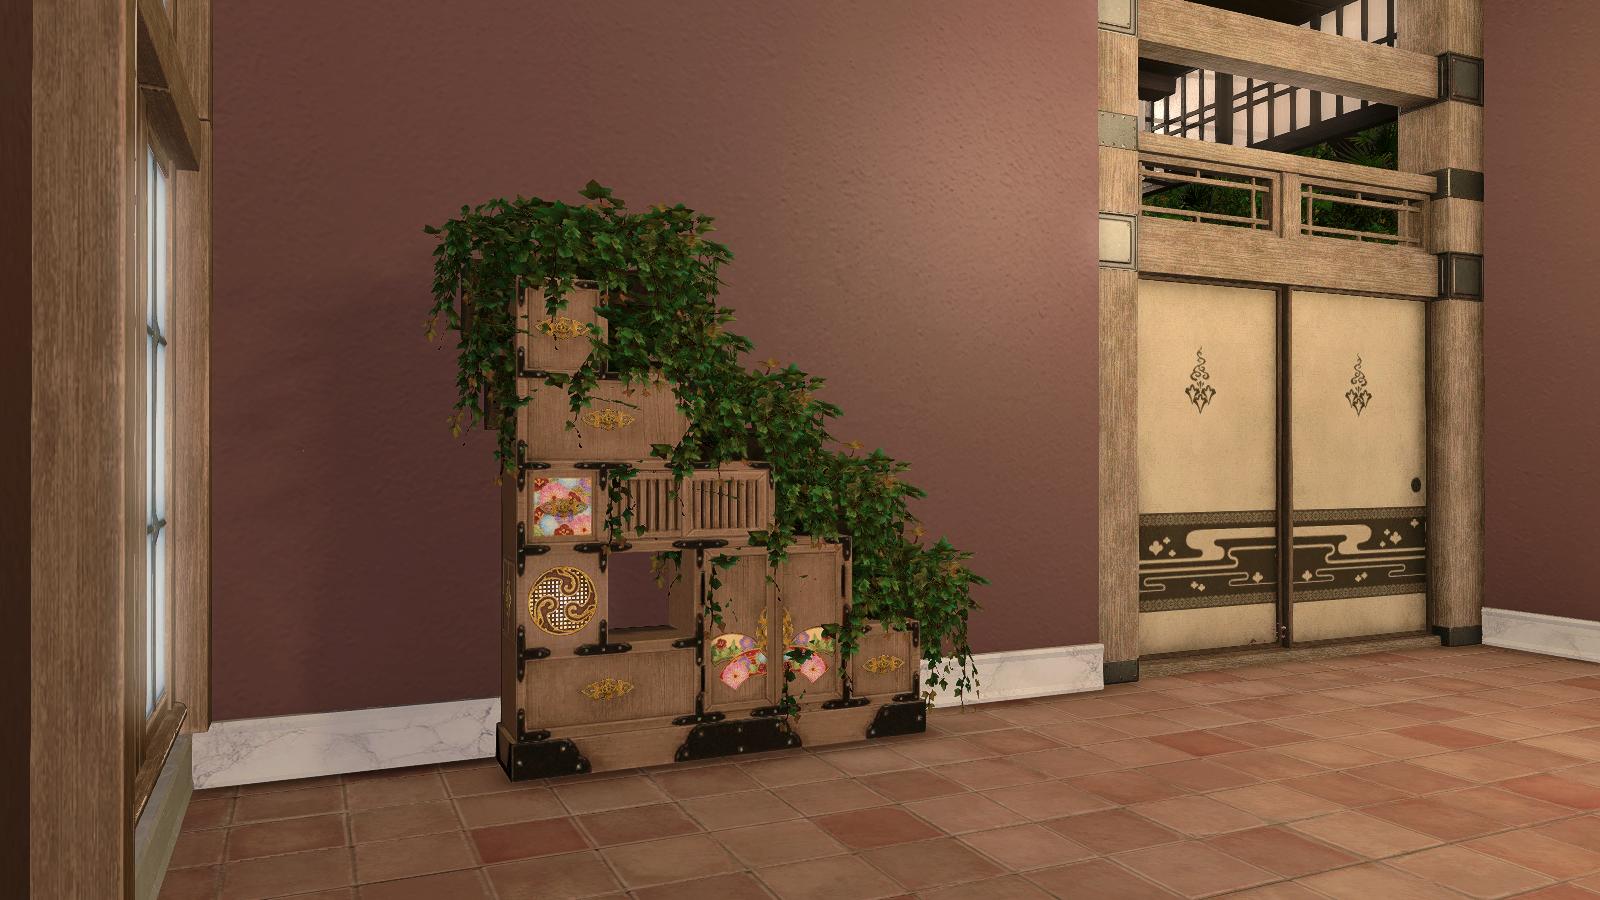 Final Fantasy Xiv Housing Showcase Hingan Kitchen